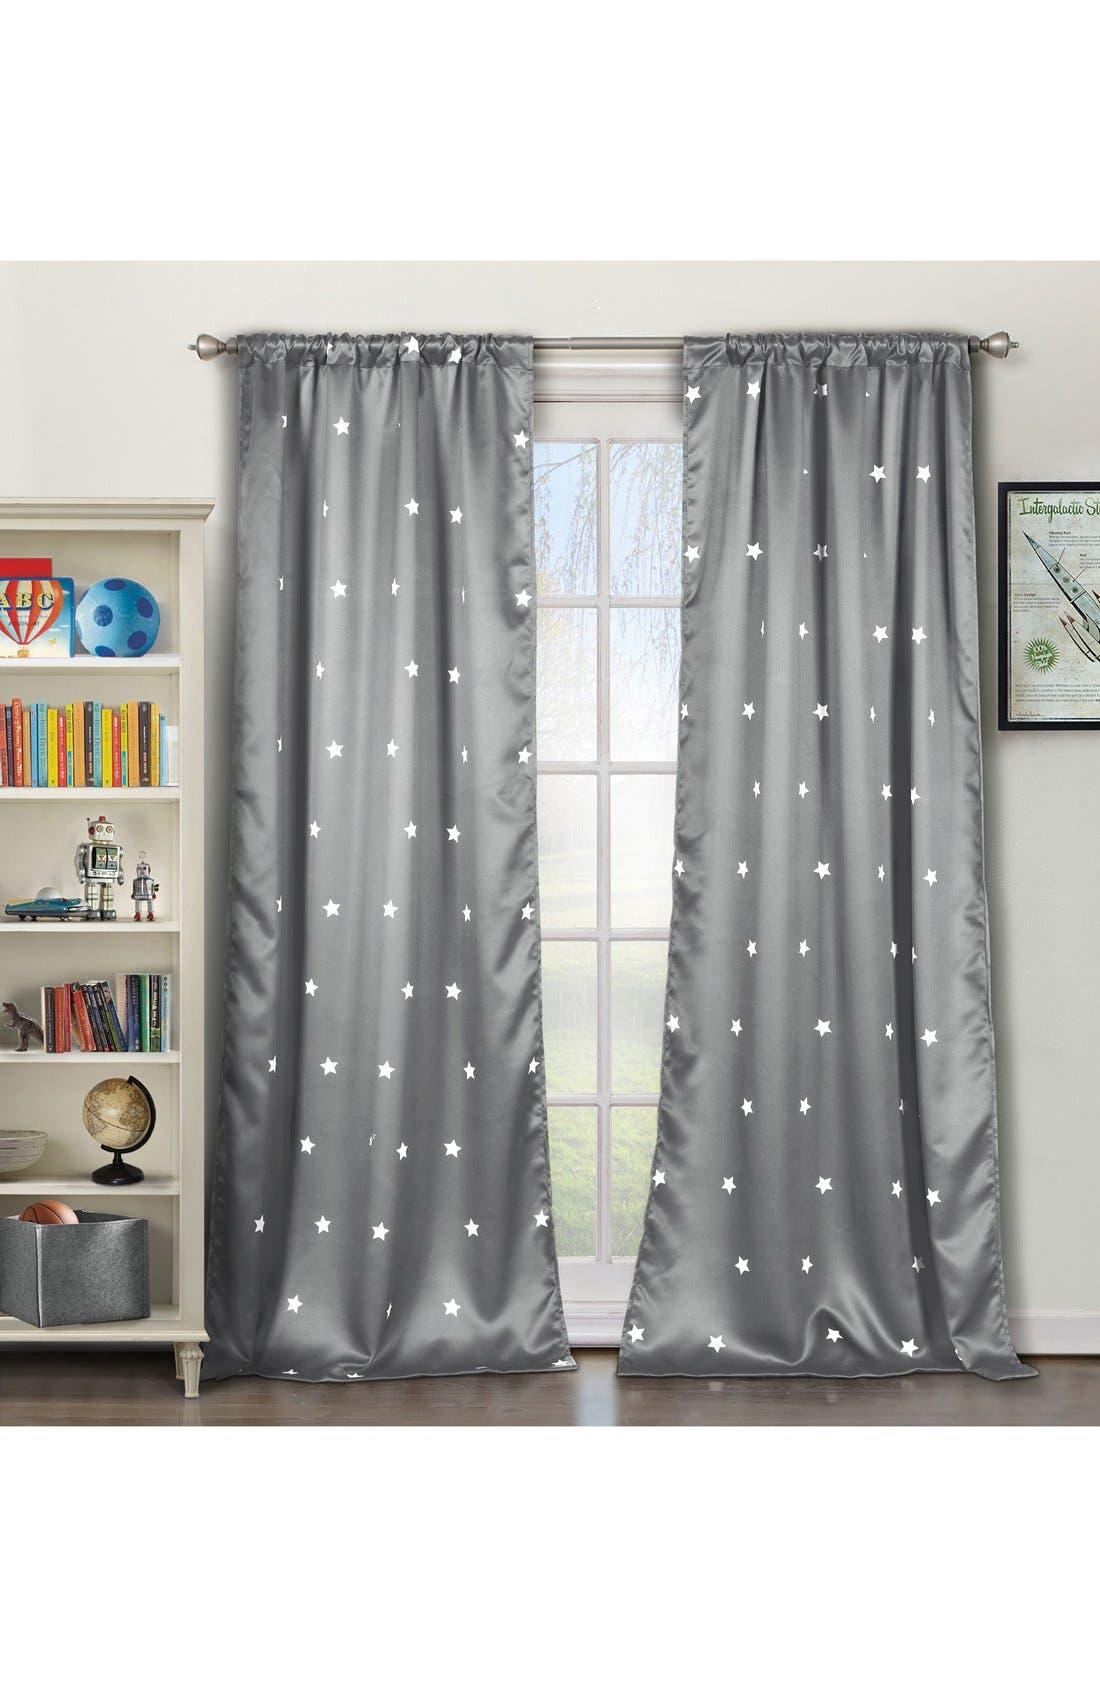 LALA + BASH Gruden Window Panels